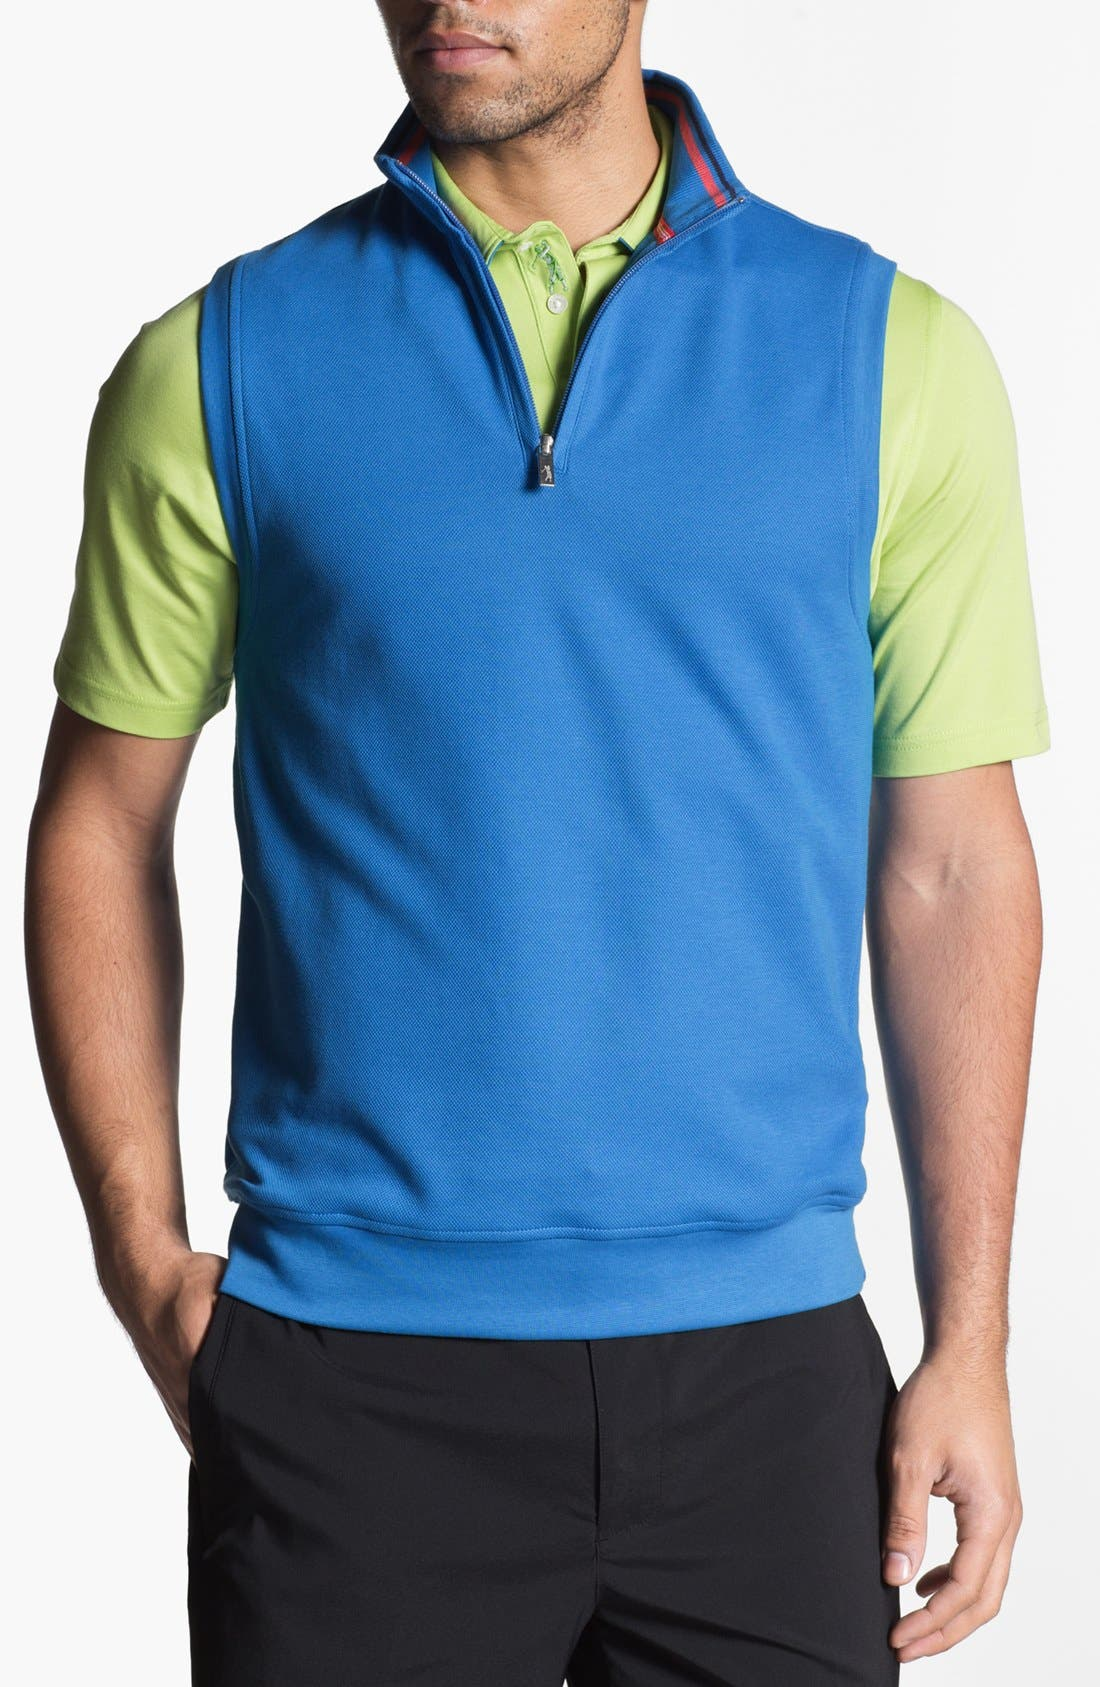 Main Image - Bobby Jones Quarter Zip Piqué Vest